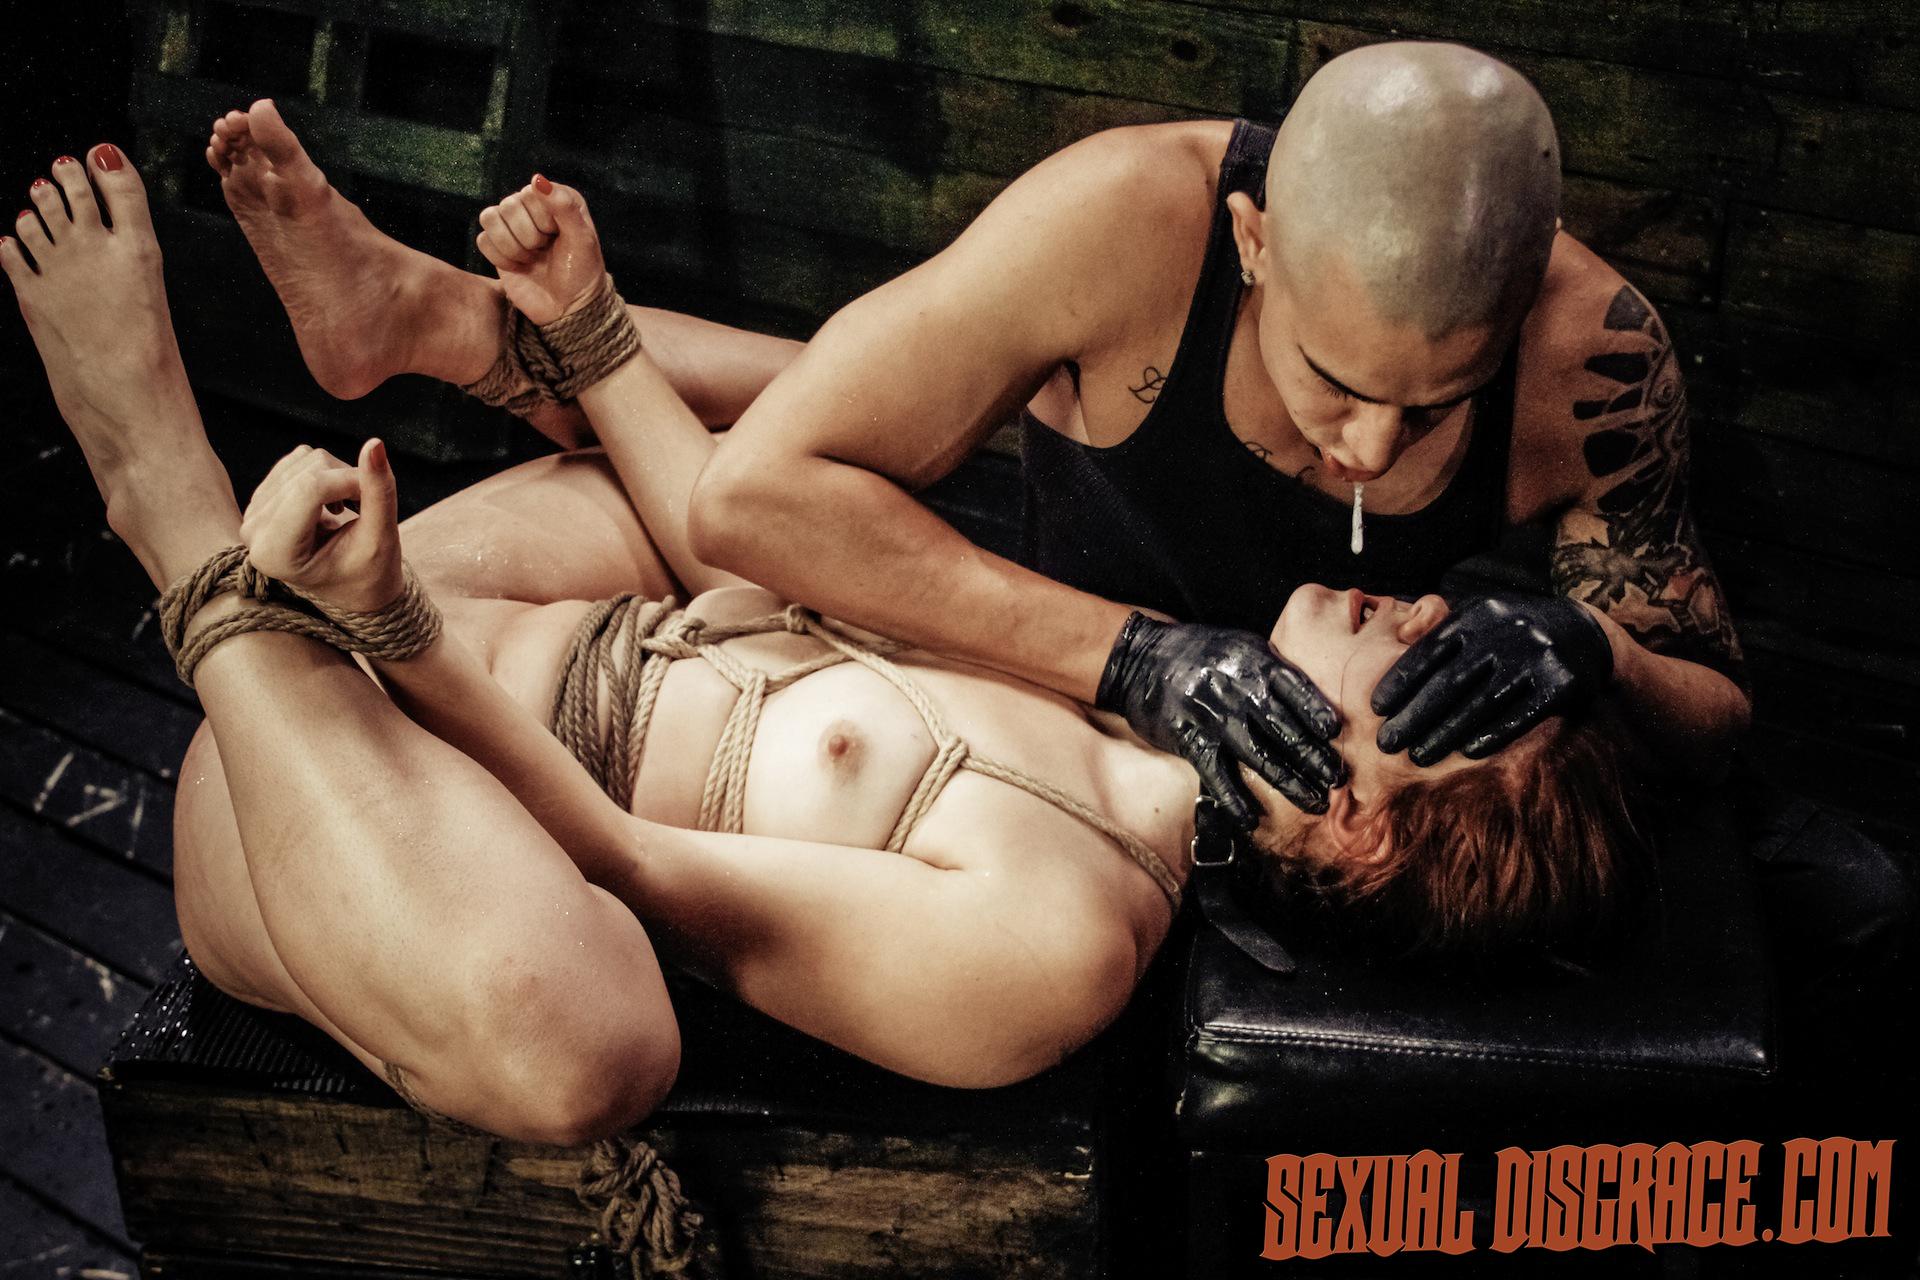 Rose Crimson Tyrell Suffers Strap Restrain Bondage, Fellate Bj, Harsh Buttfuck Fuckfest, Sybian Saddle, Drizzling